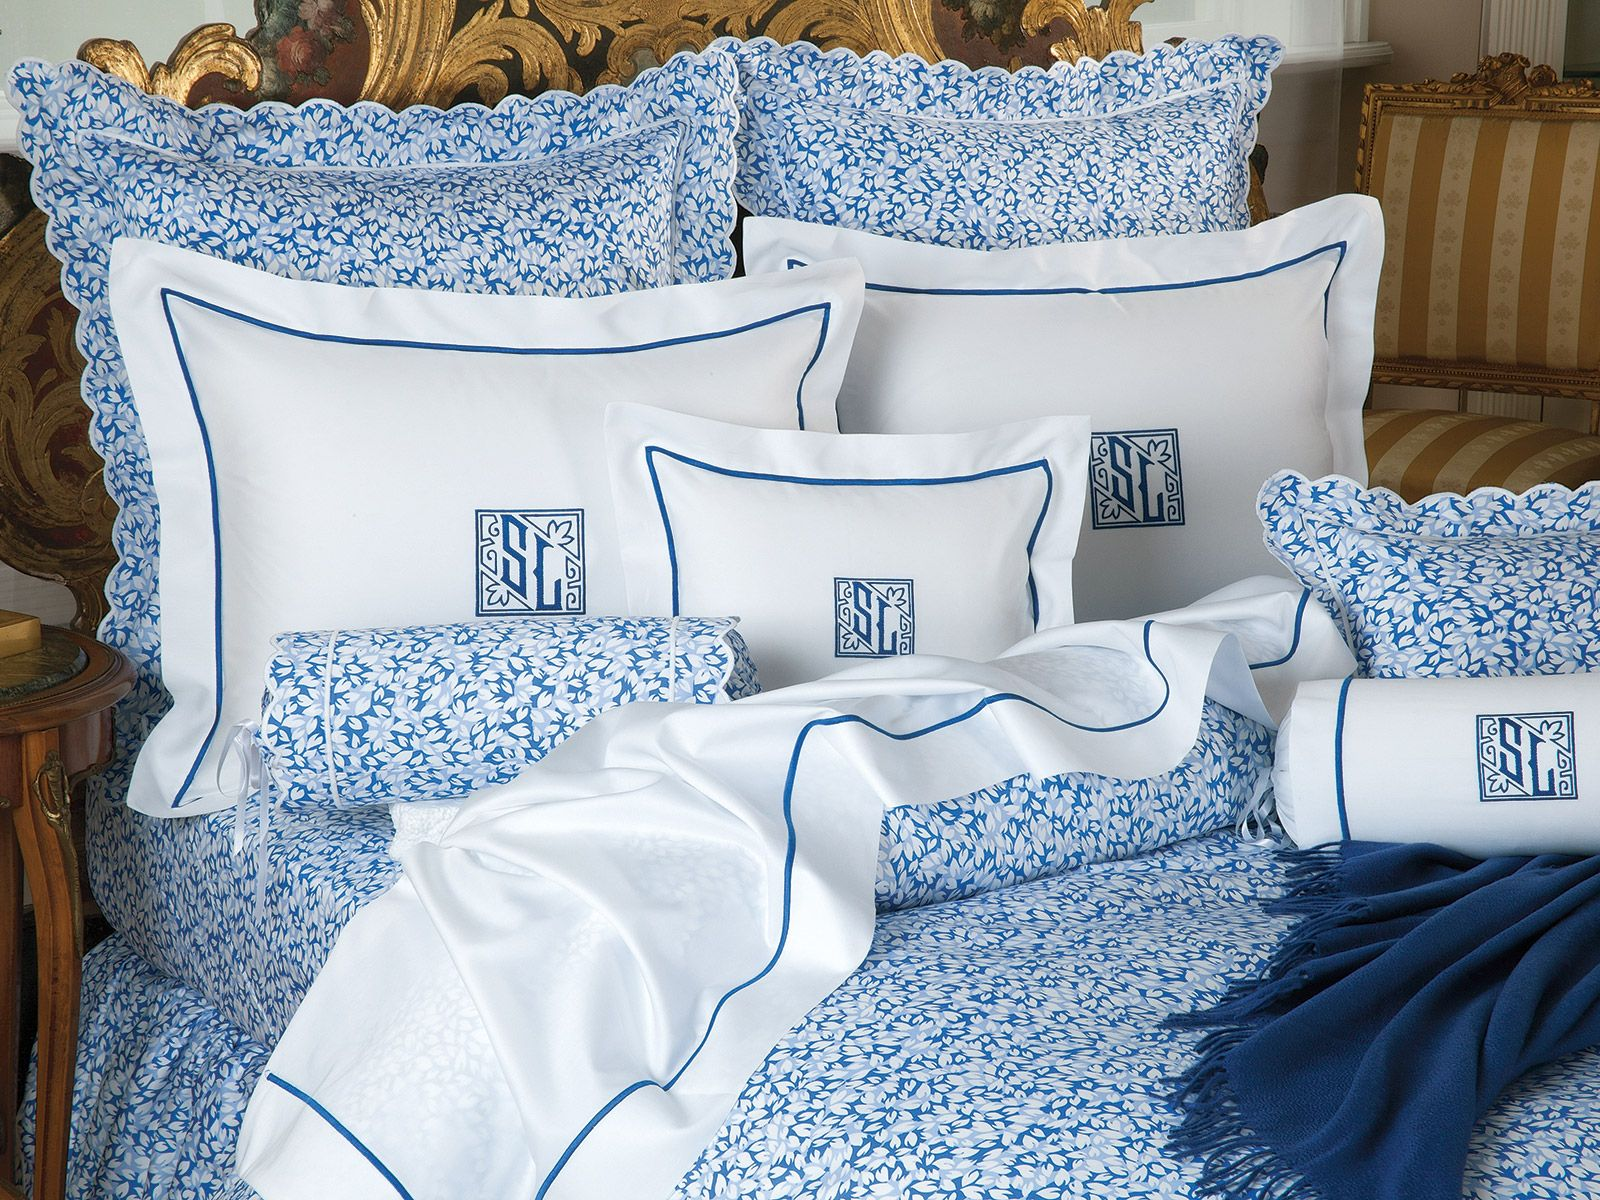 Petals - Luxury Bedding Breezy white #petals dapple a vibrant ...